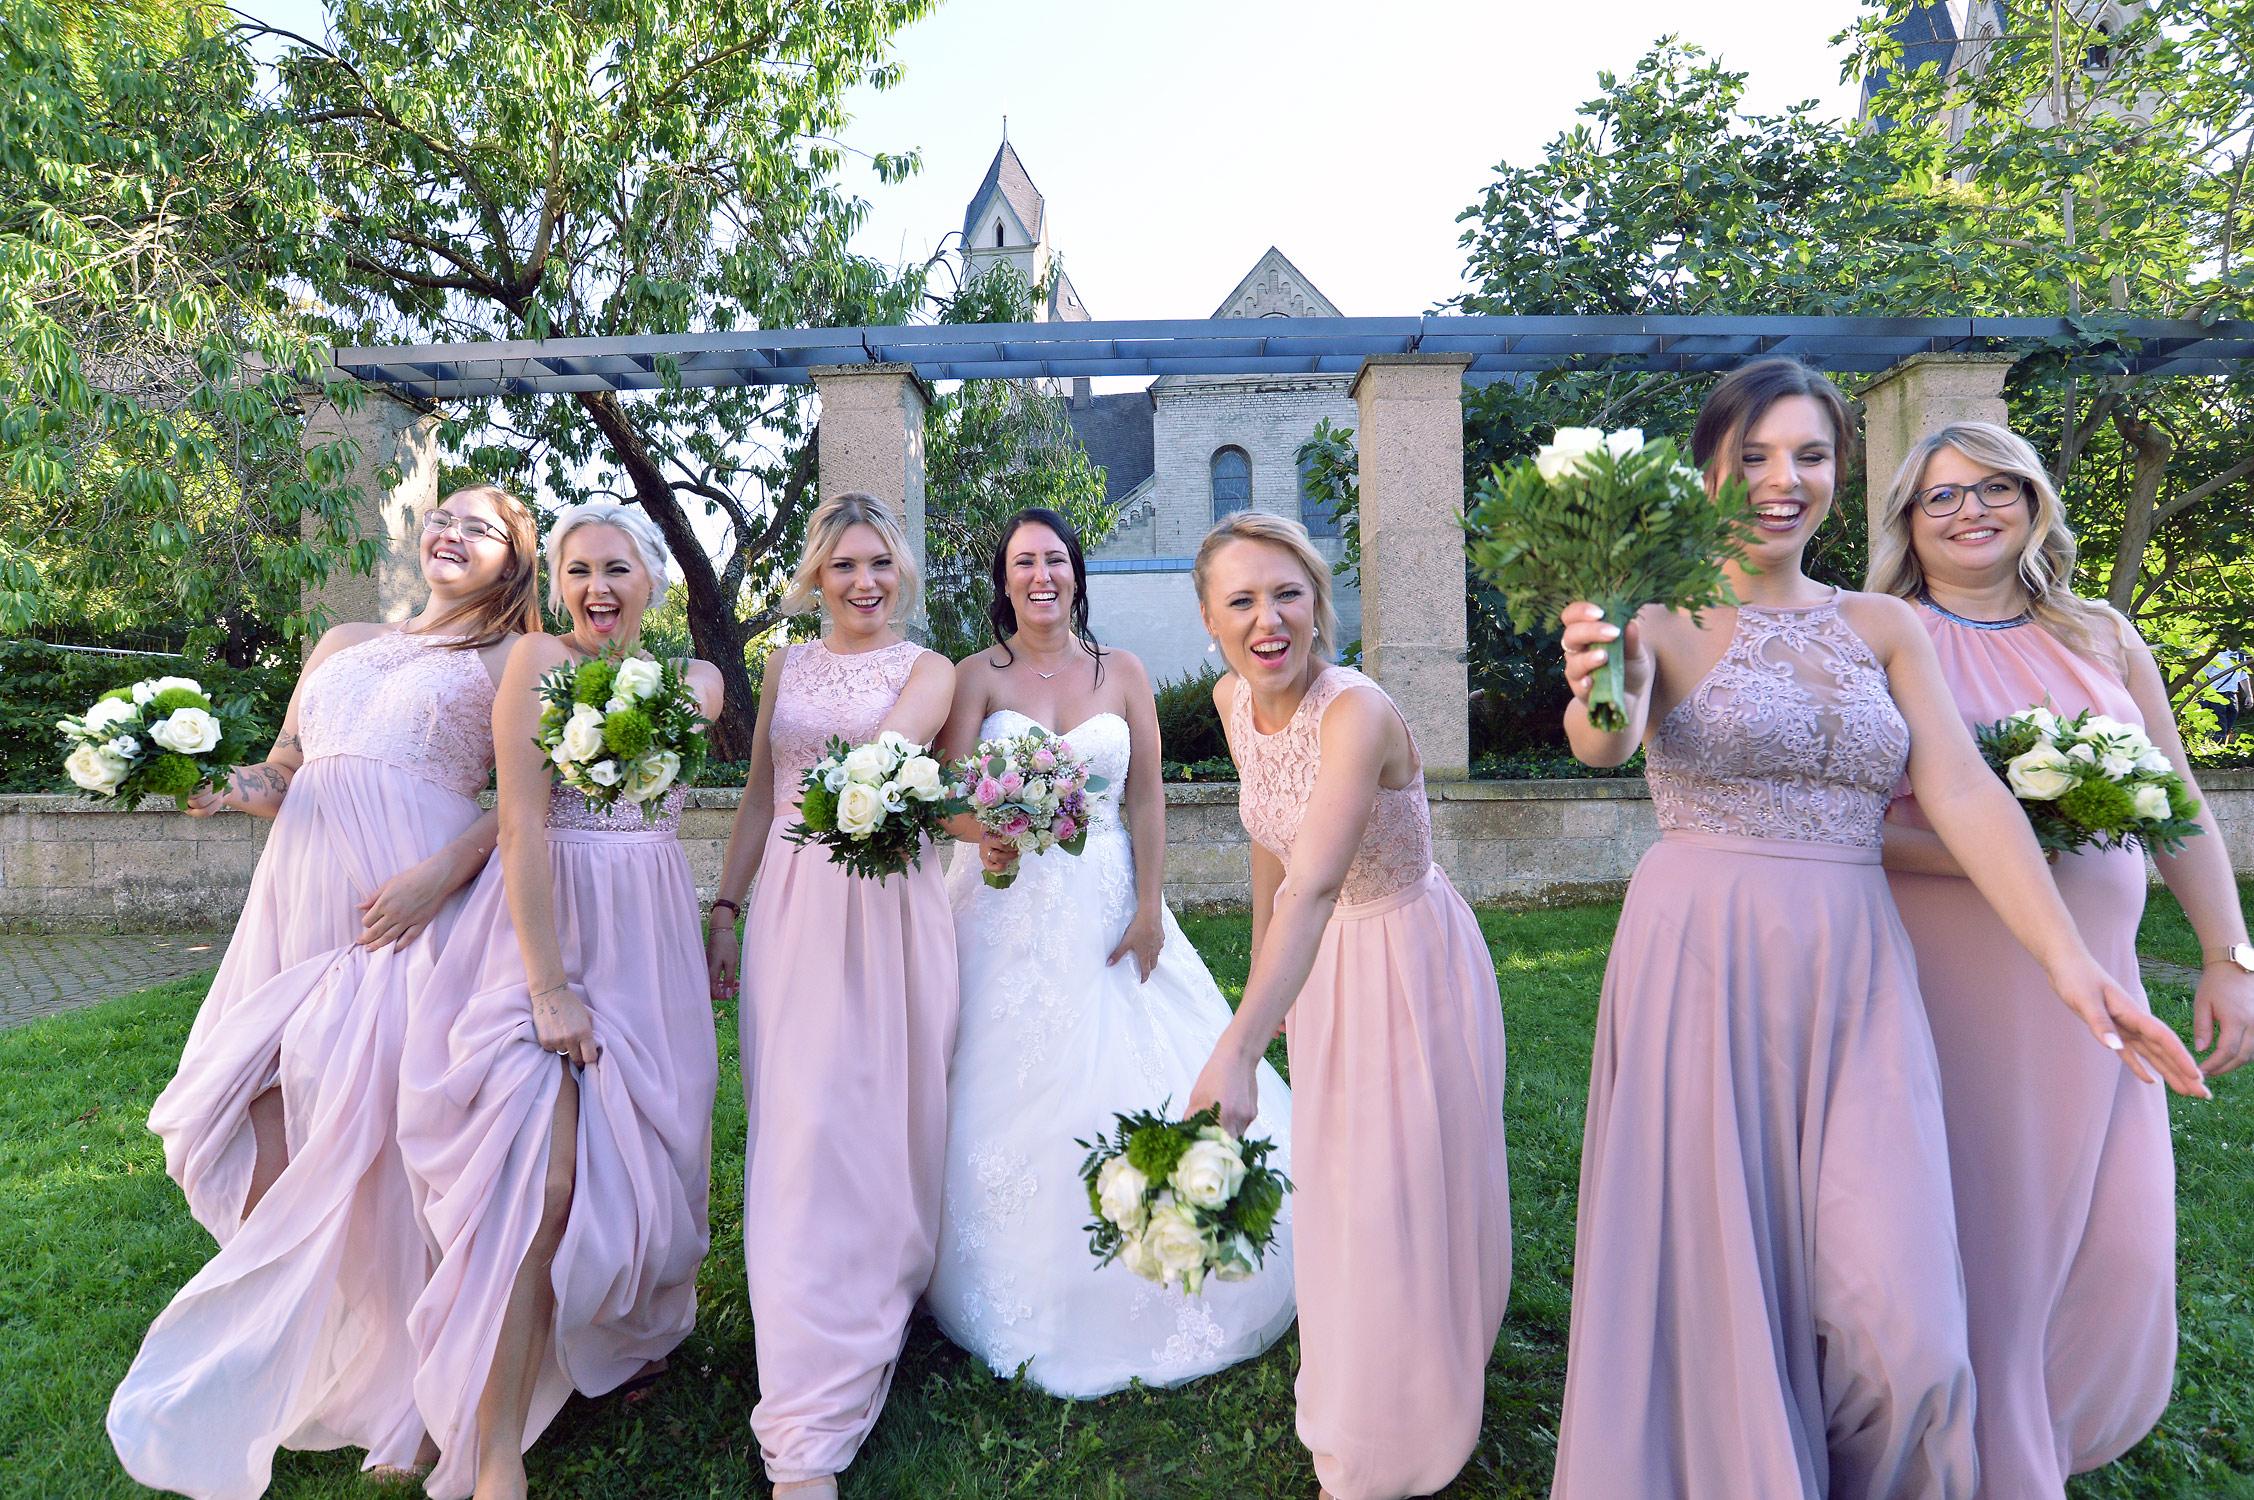 Hochzeitsfotografin-Koblenz-Nicole-Bouillon-Fotografie1